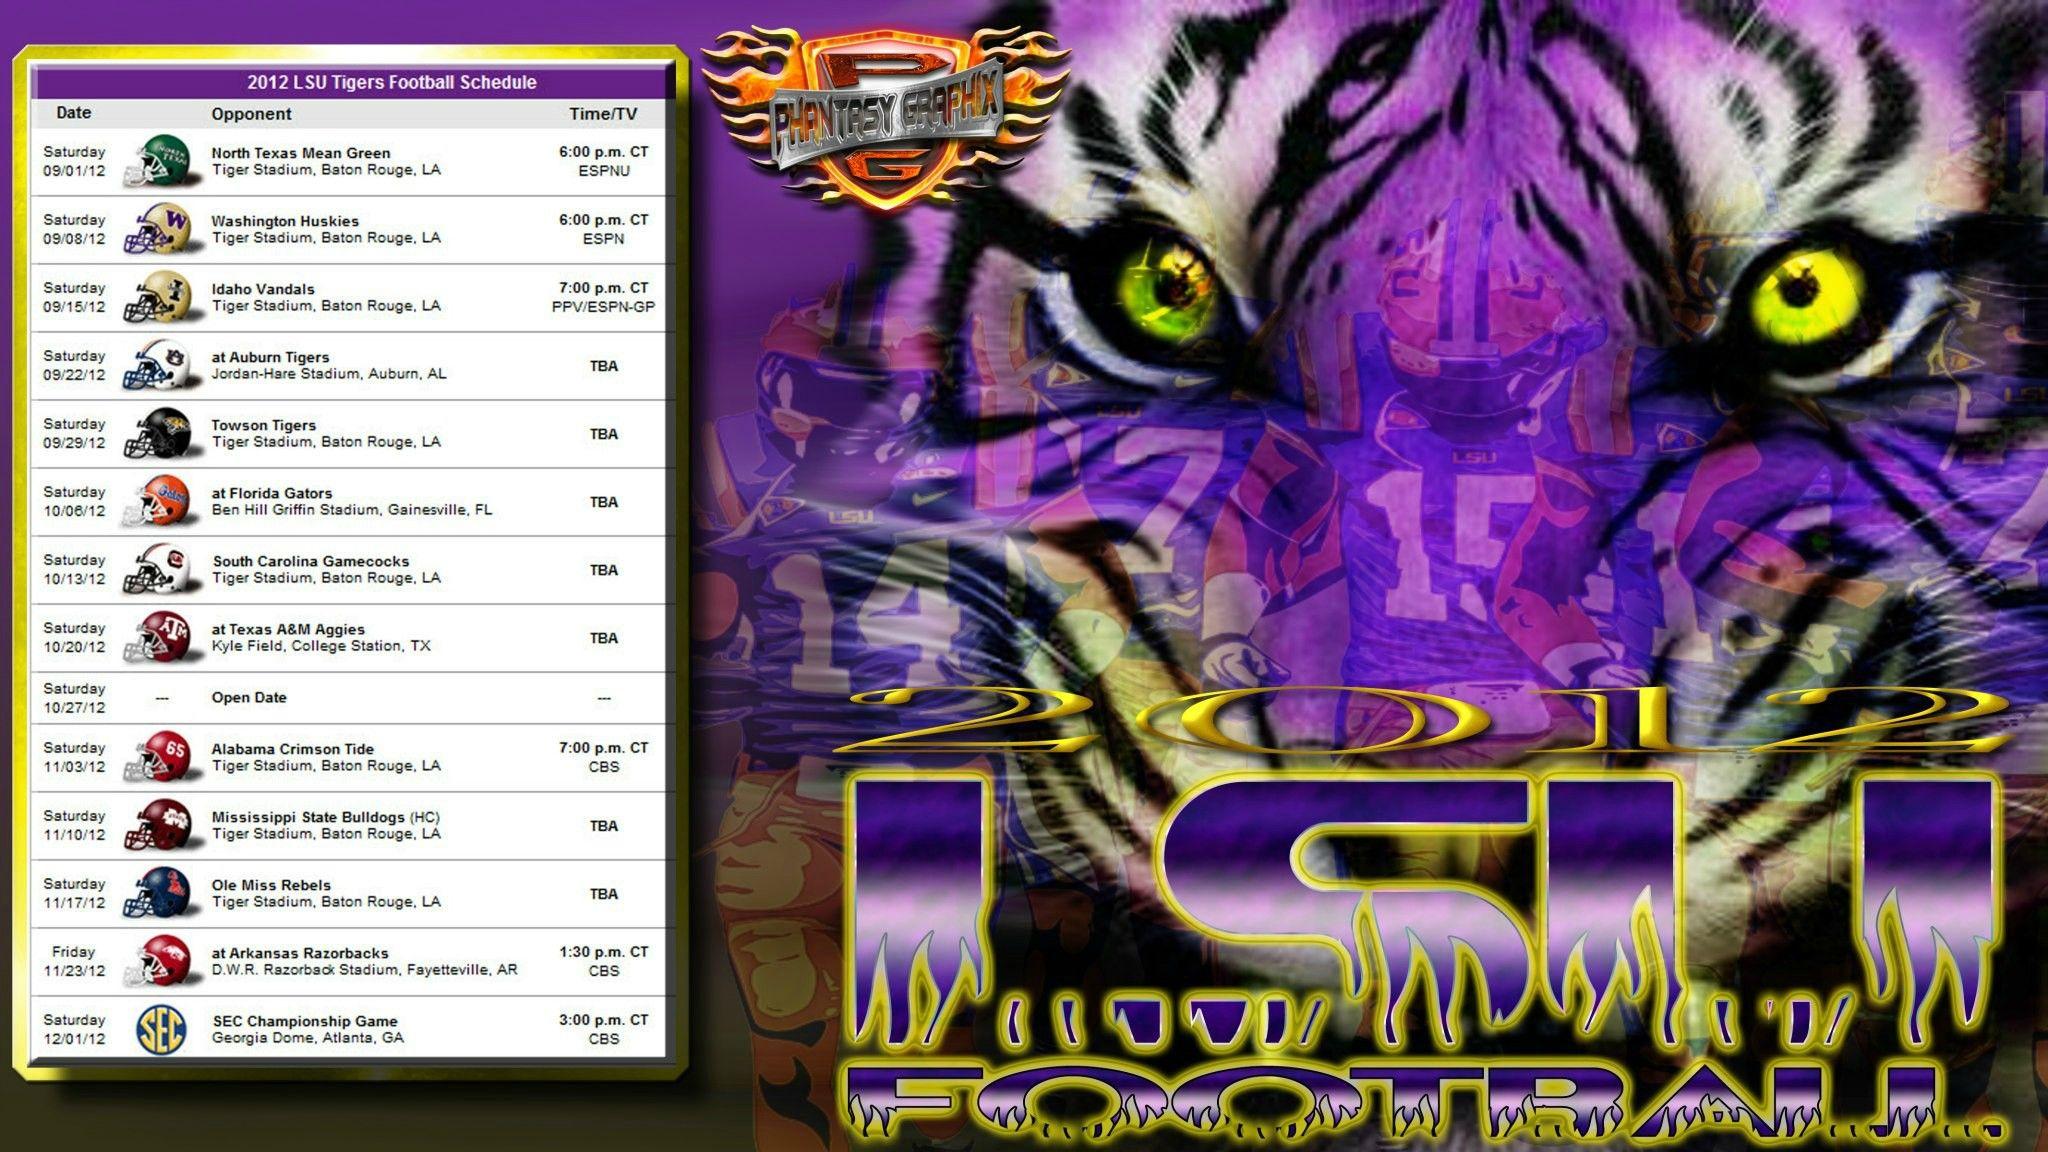 2020 Other Images Lsu Football Wallpaper (с изображениями)